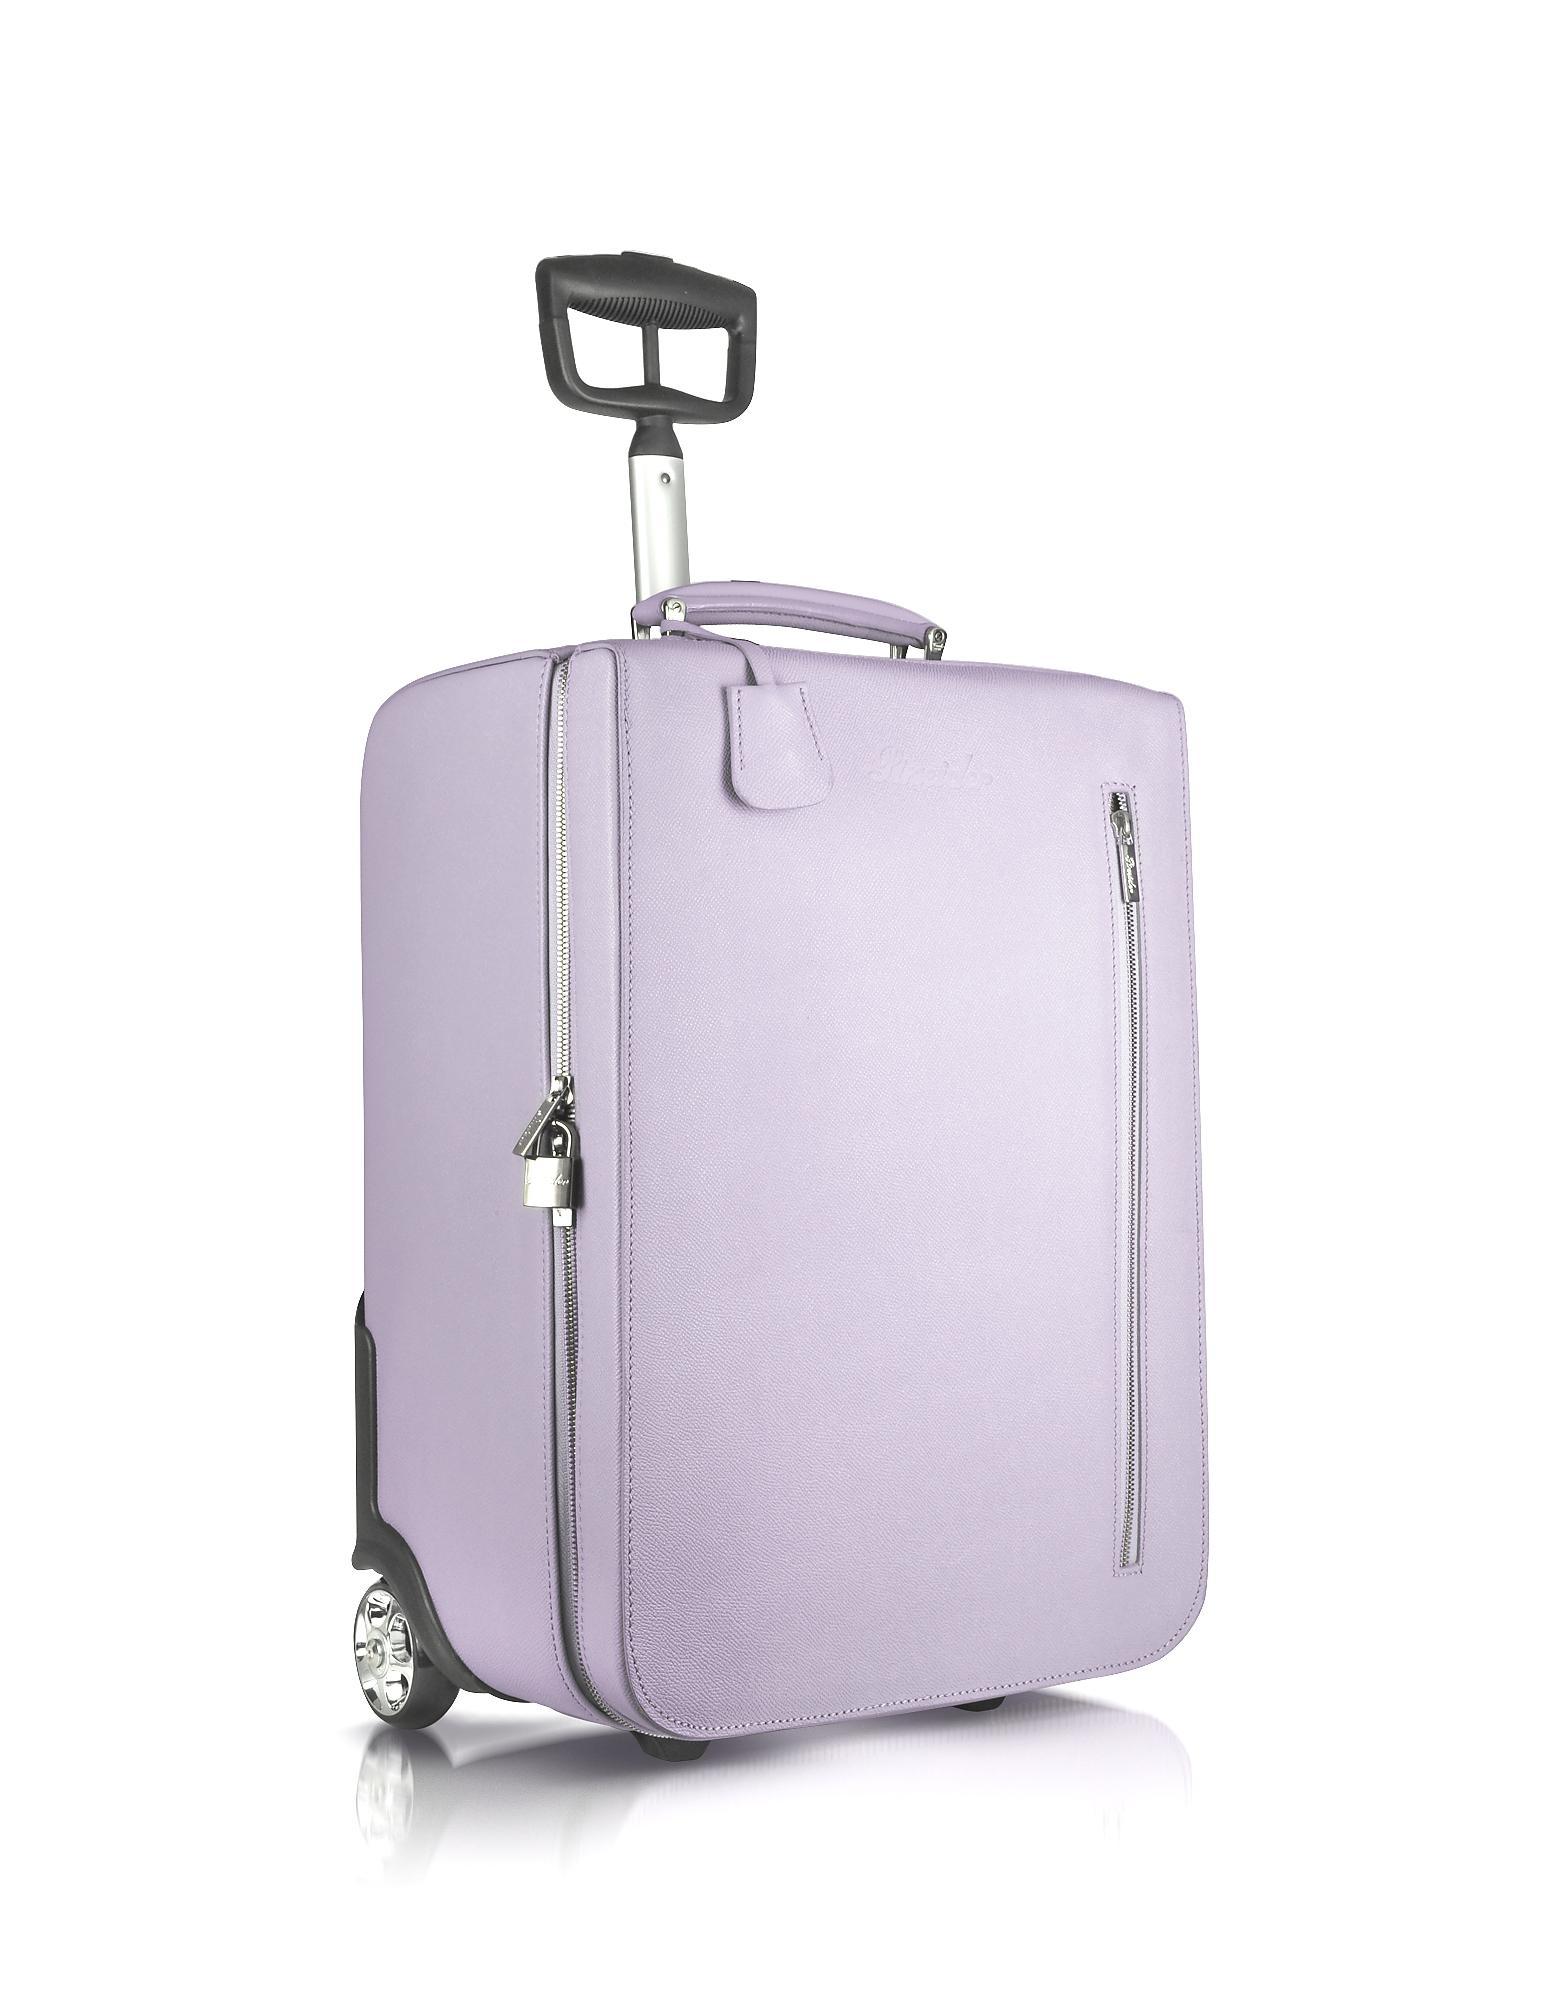 Pineider City Chic - Calfskin Trolley Upright In Lavender